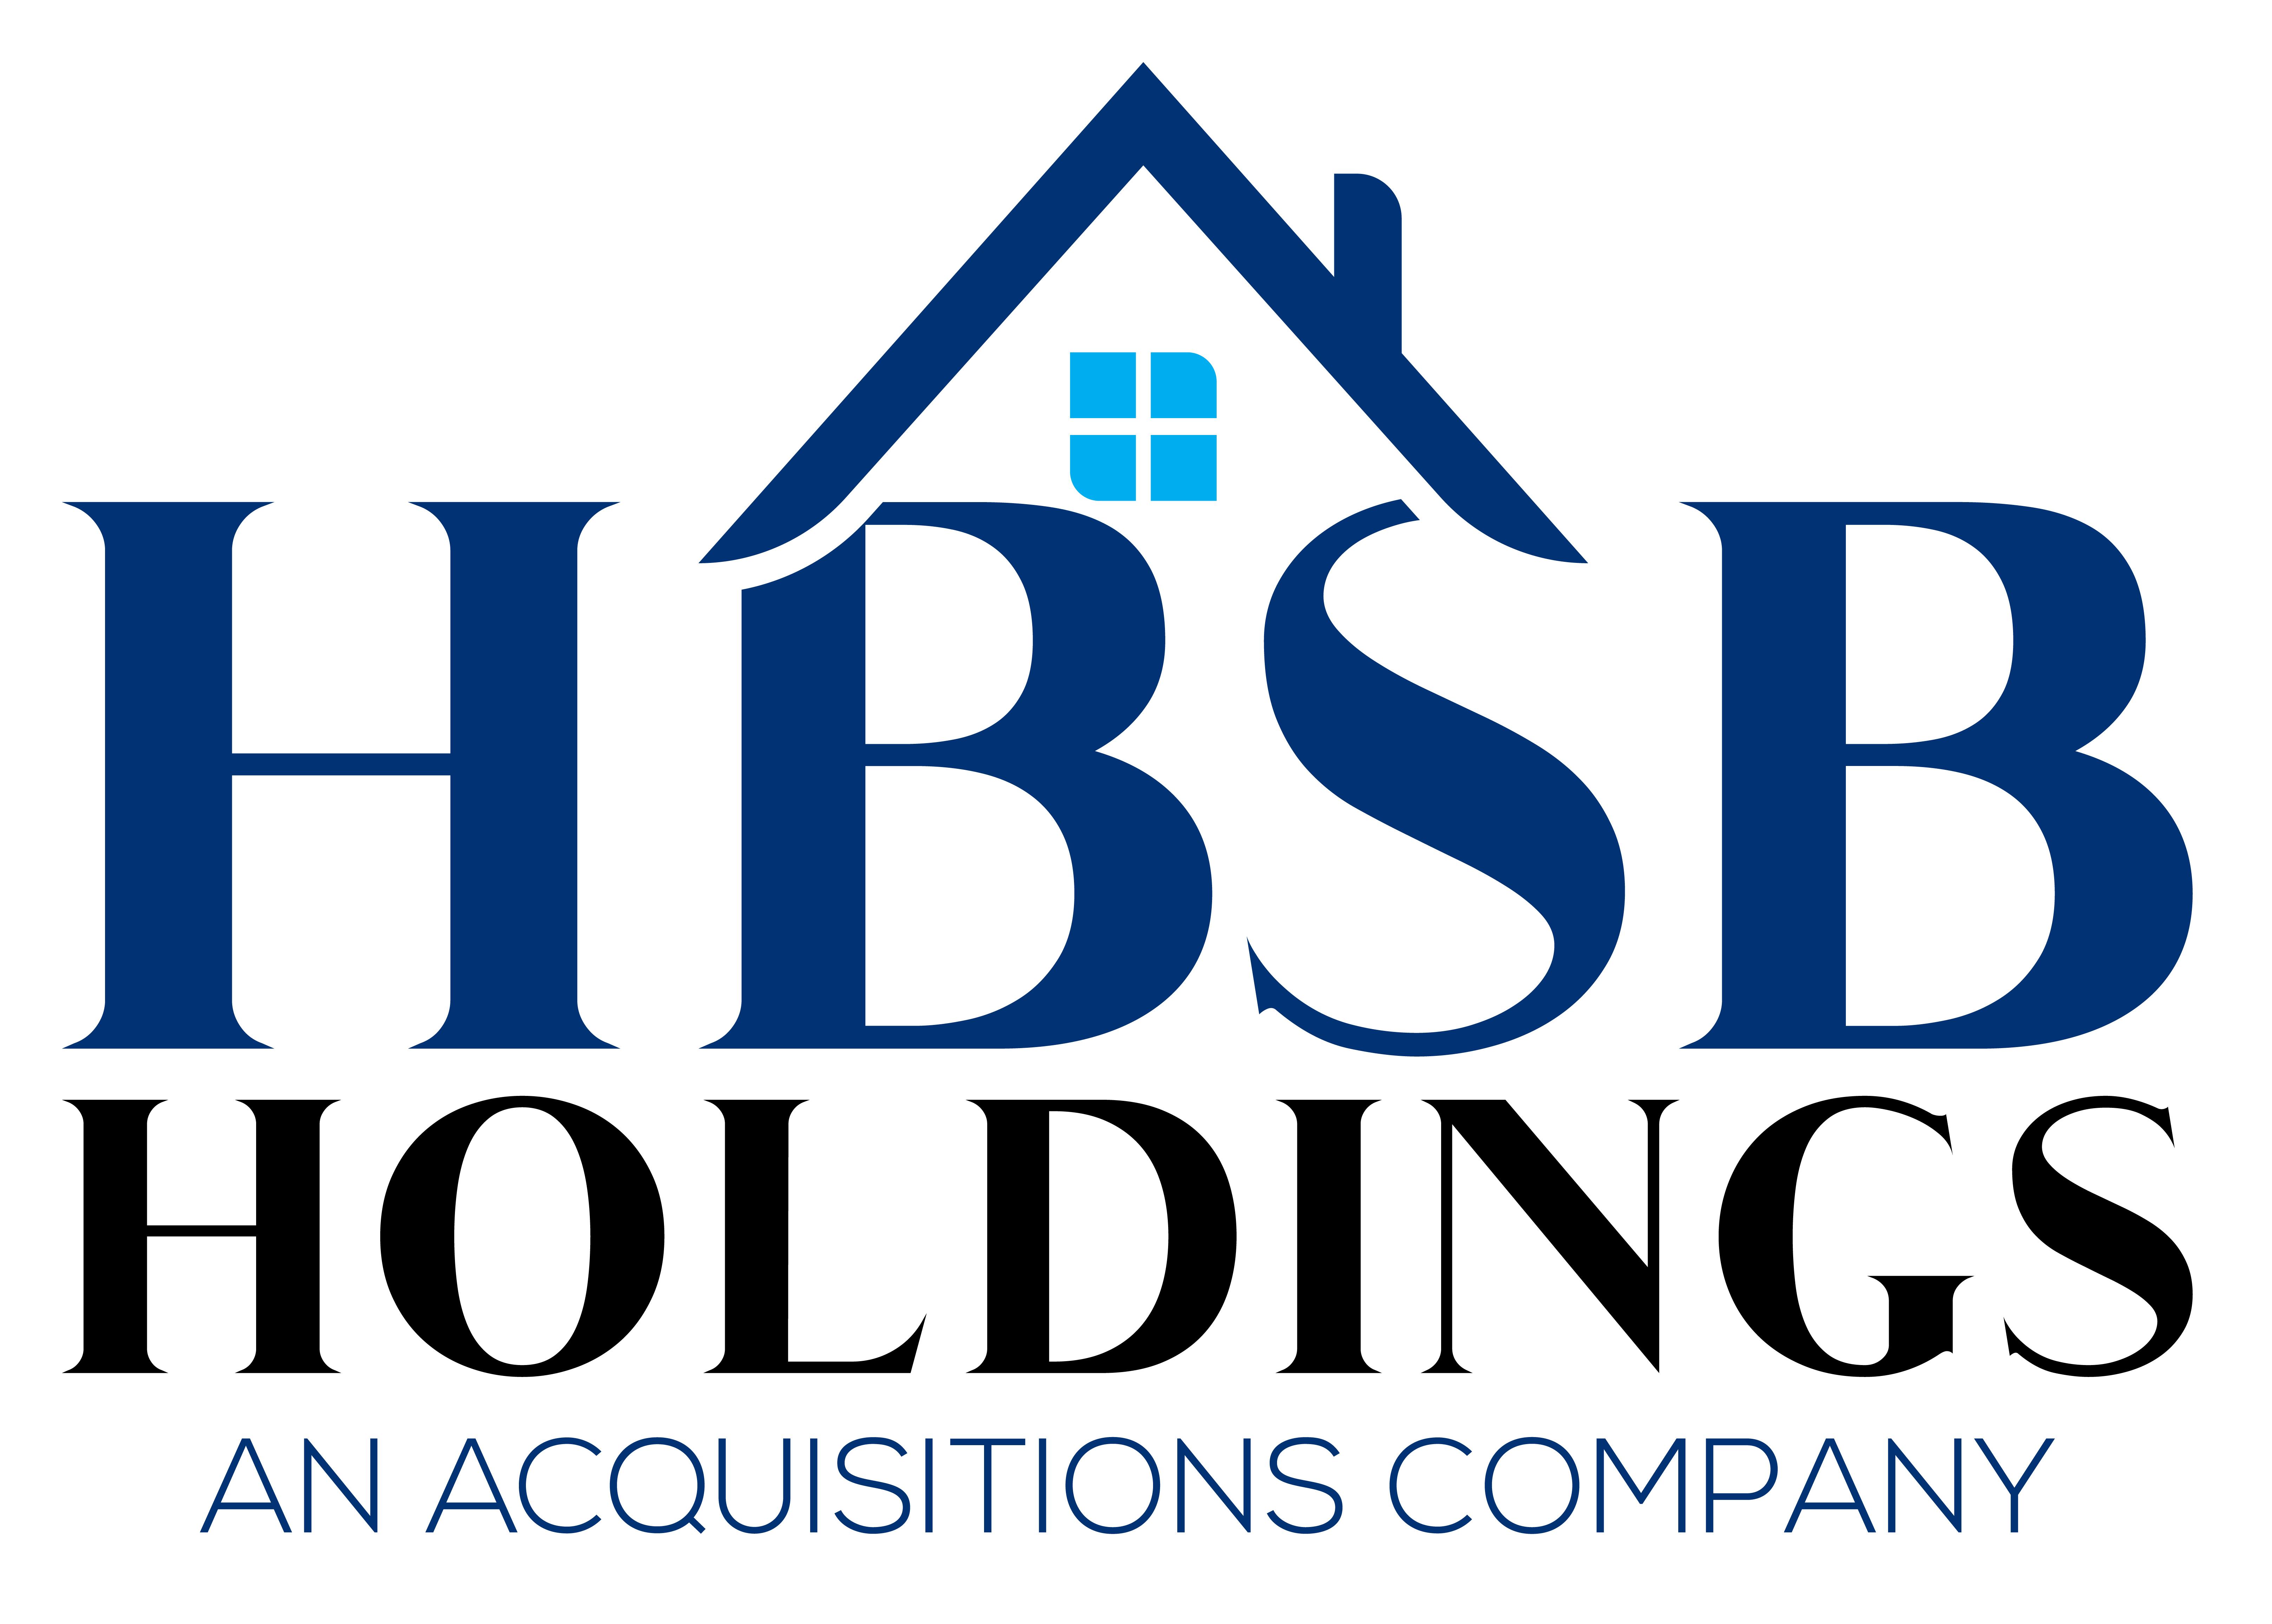 HBSB Holdings, LLC logo